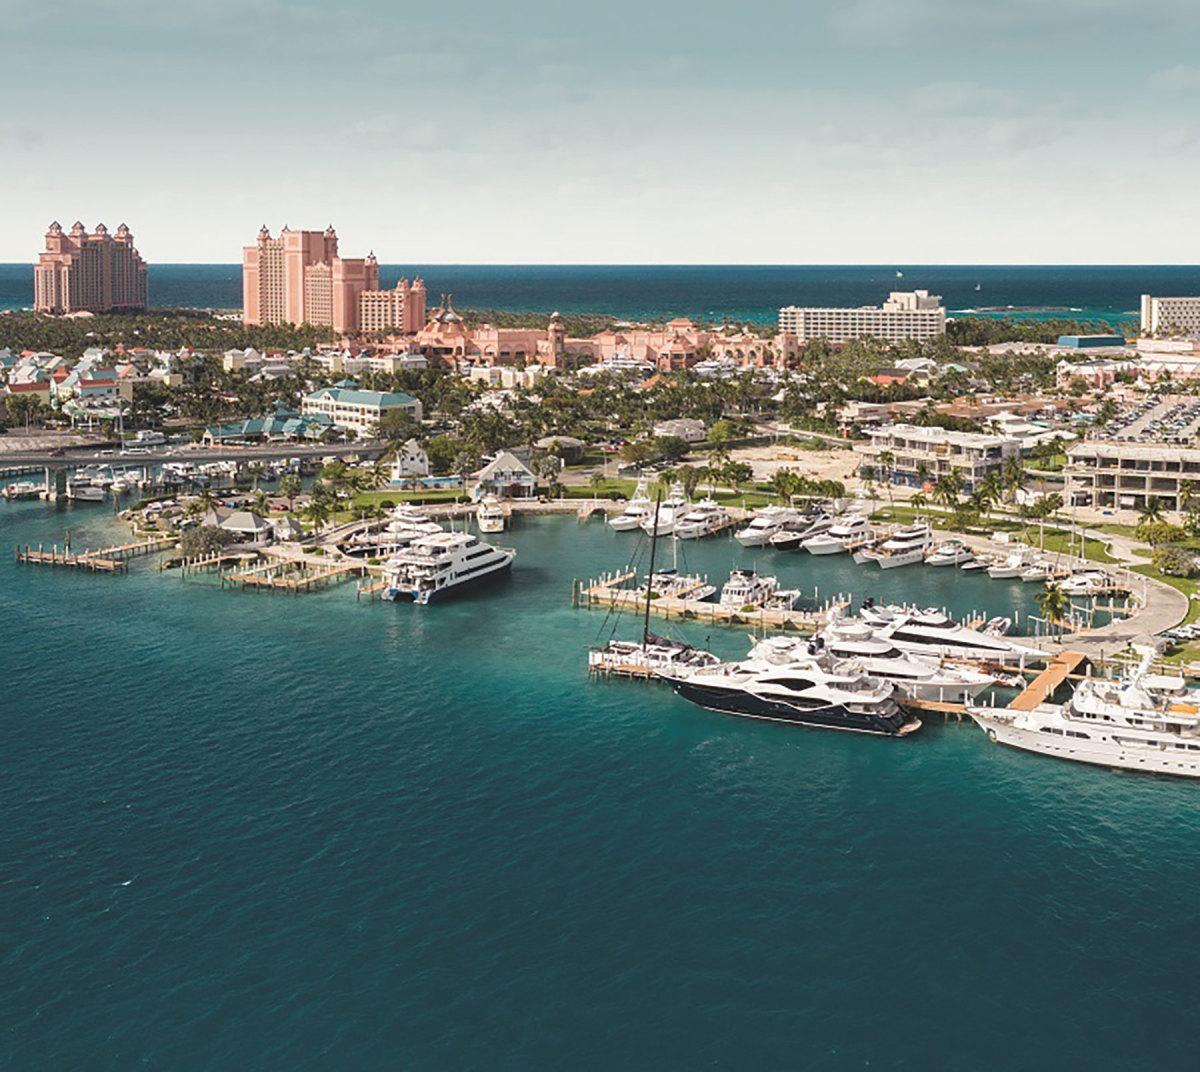 Aerial view of original Hurricane Hole Marina